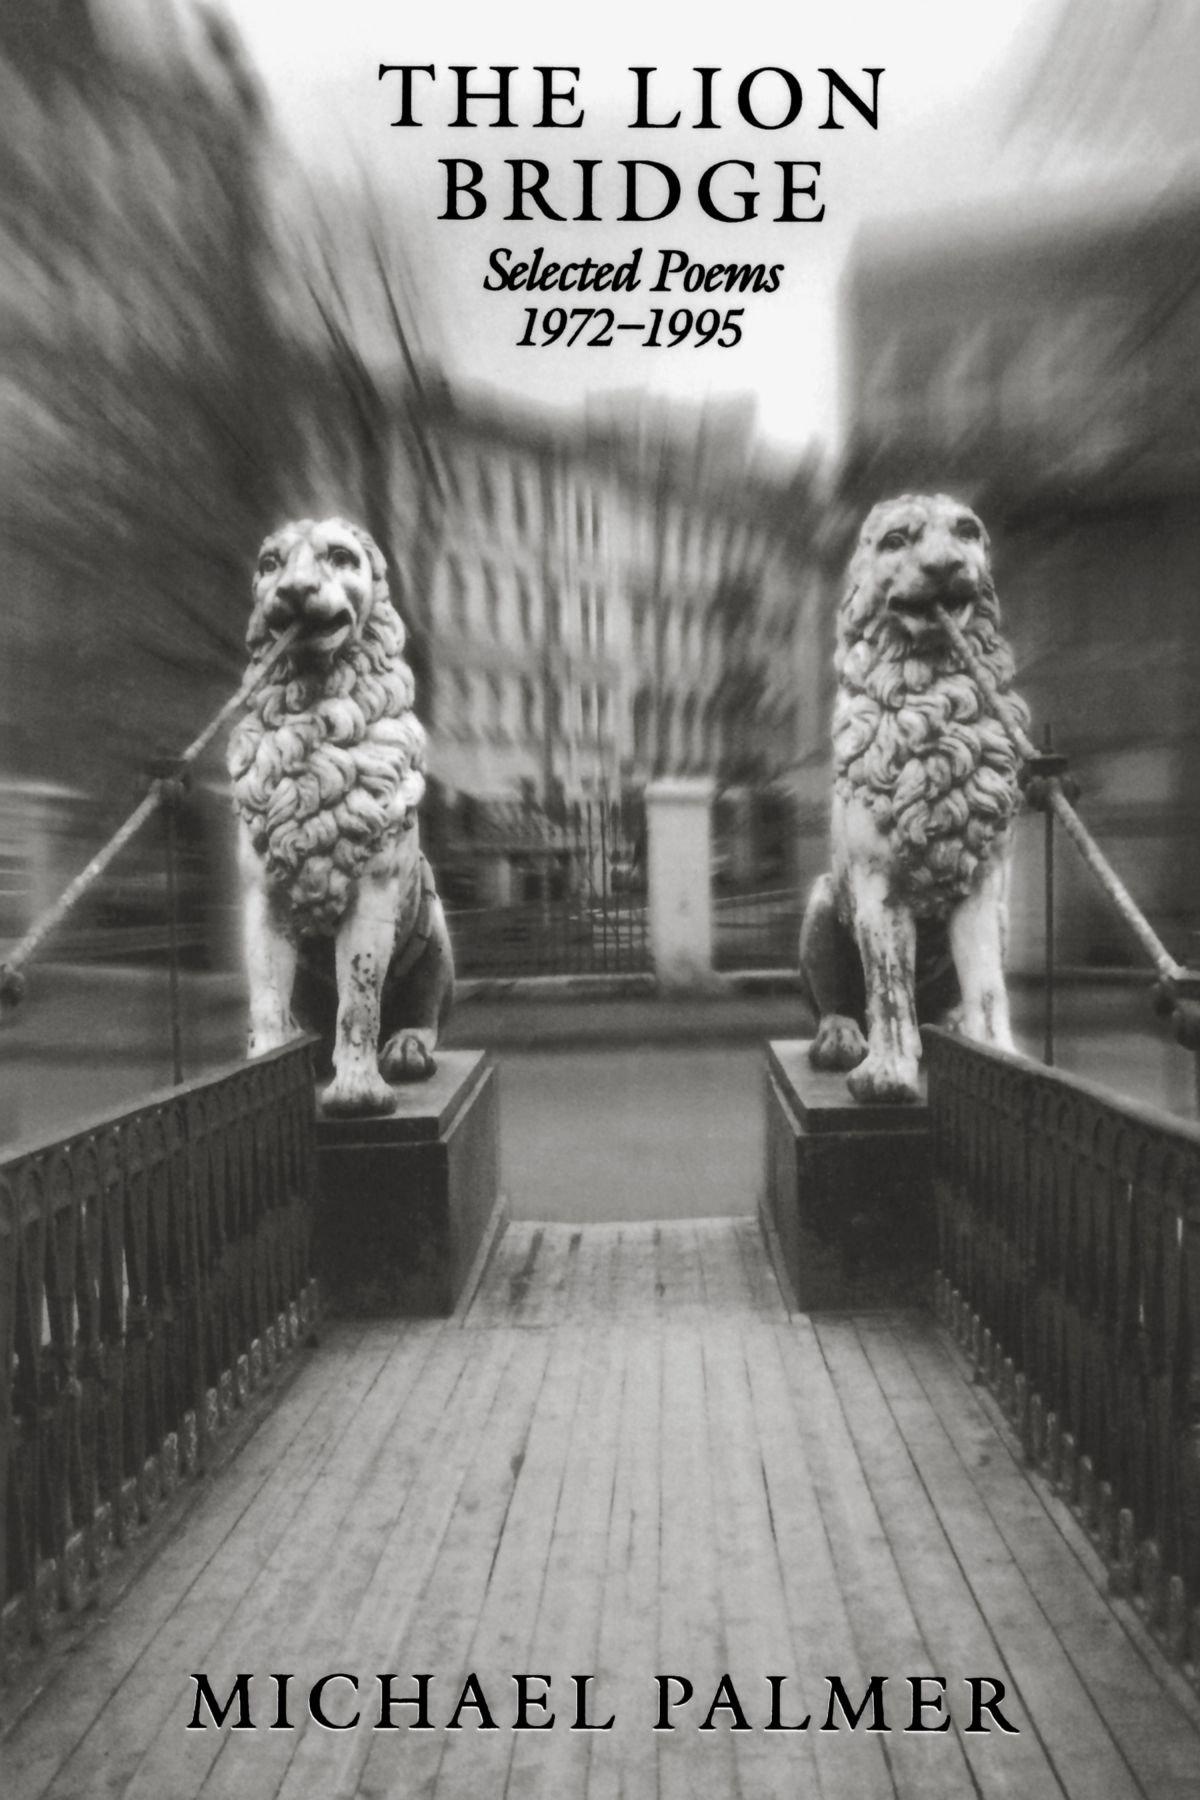 The Lion Bridge: Selected Poems 1972-1995: Michael Palmer